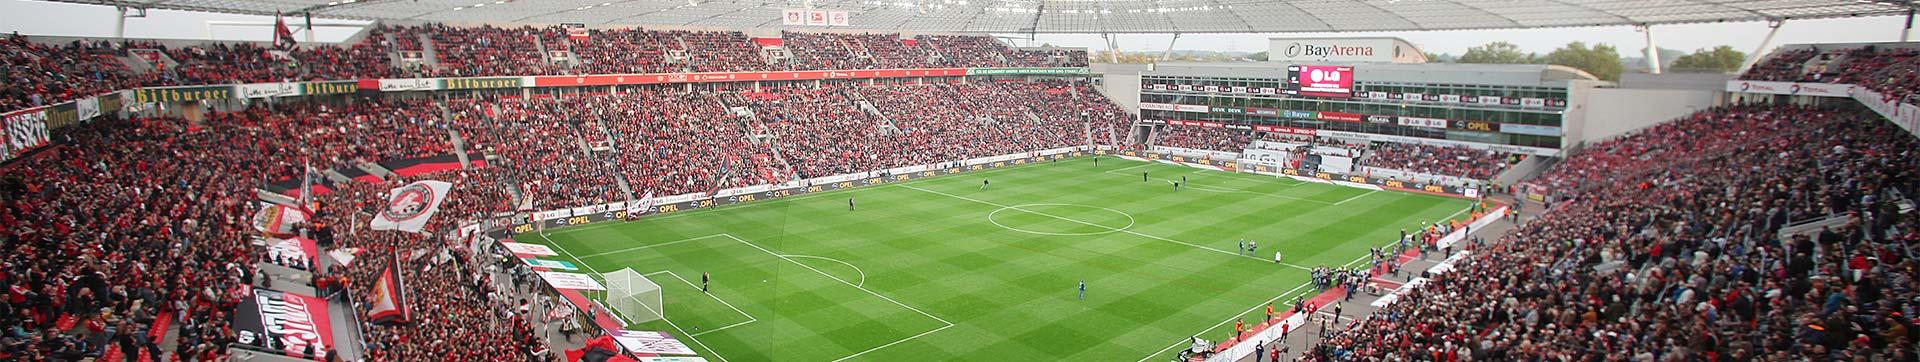 Bayer Leverkusen 04 Case Study